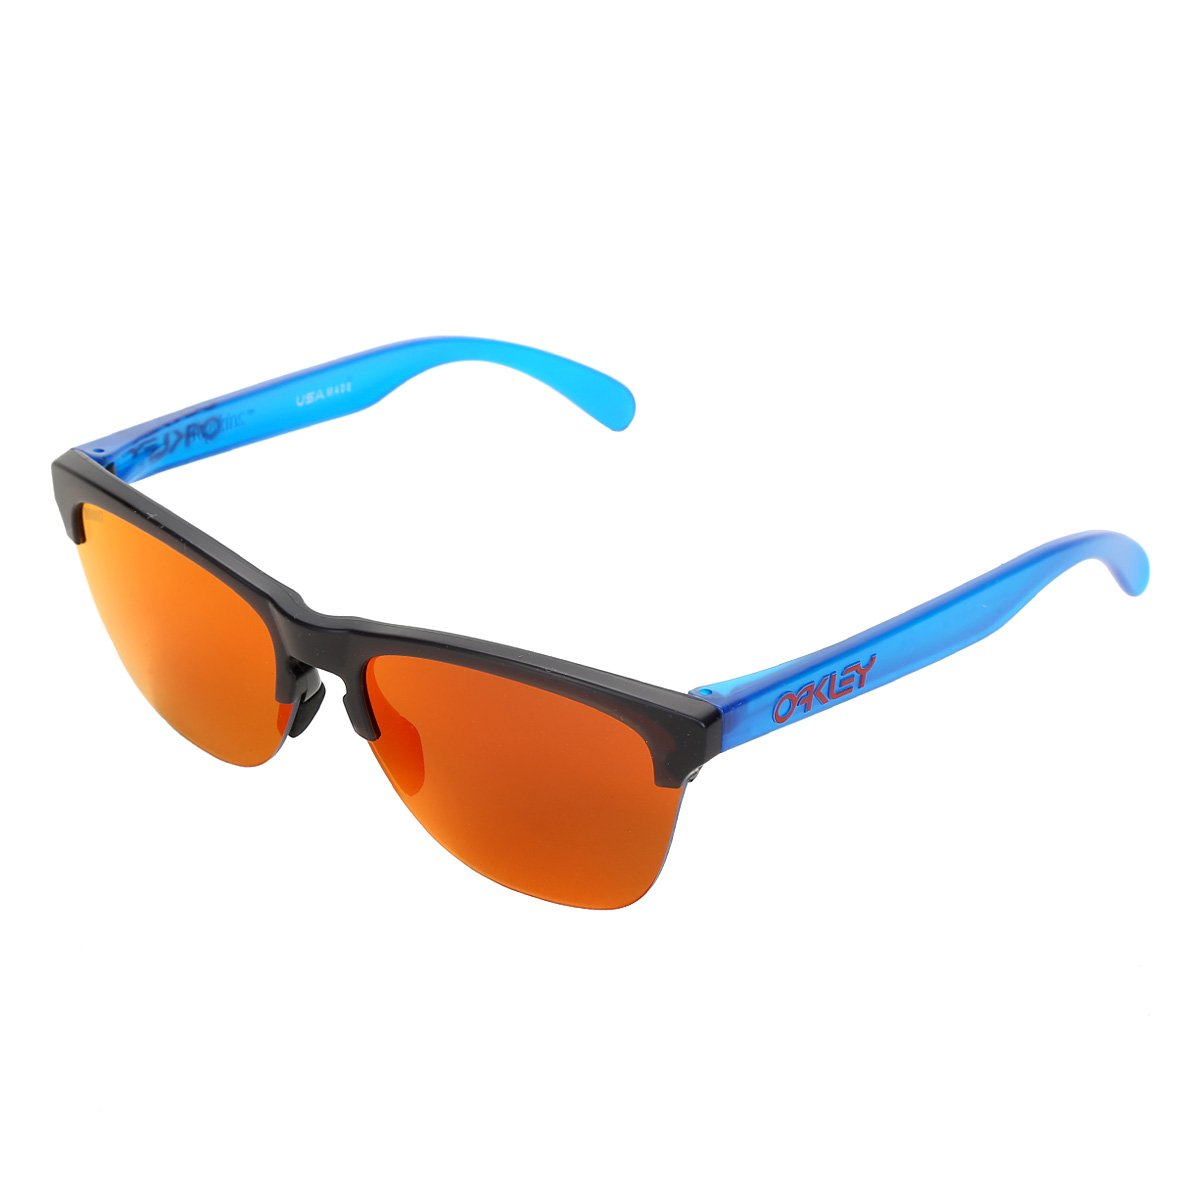 Óculos Oakley Frogskins Lite